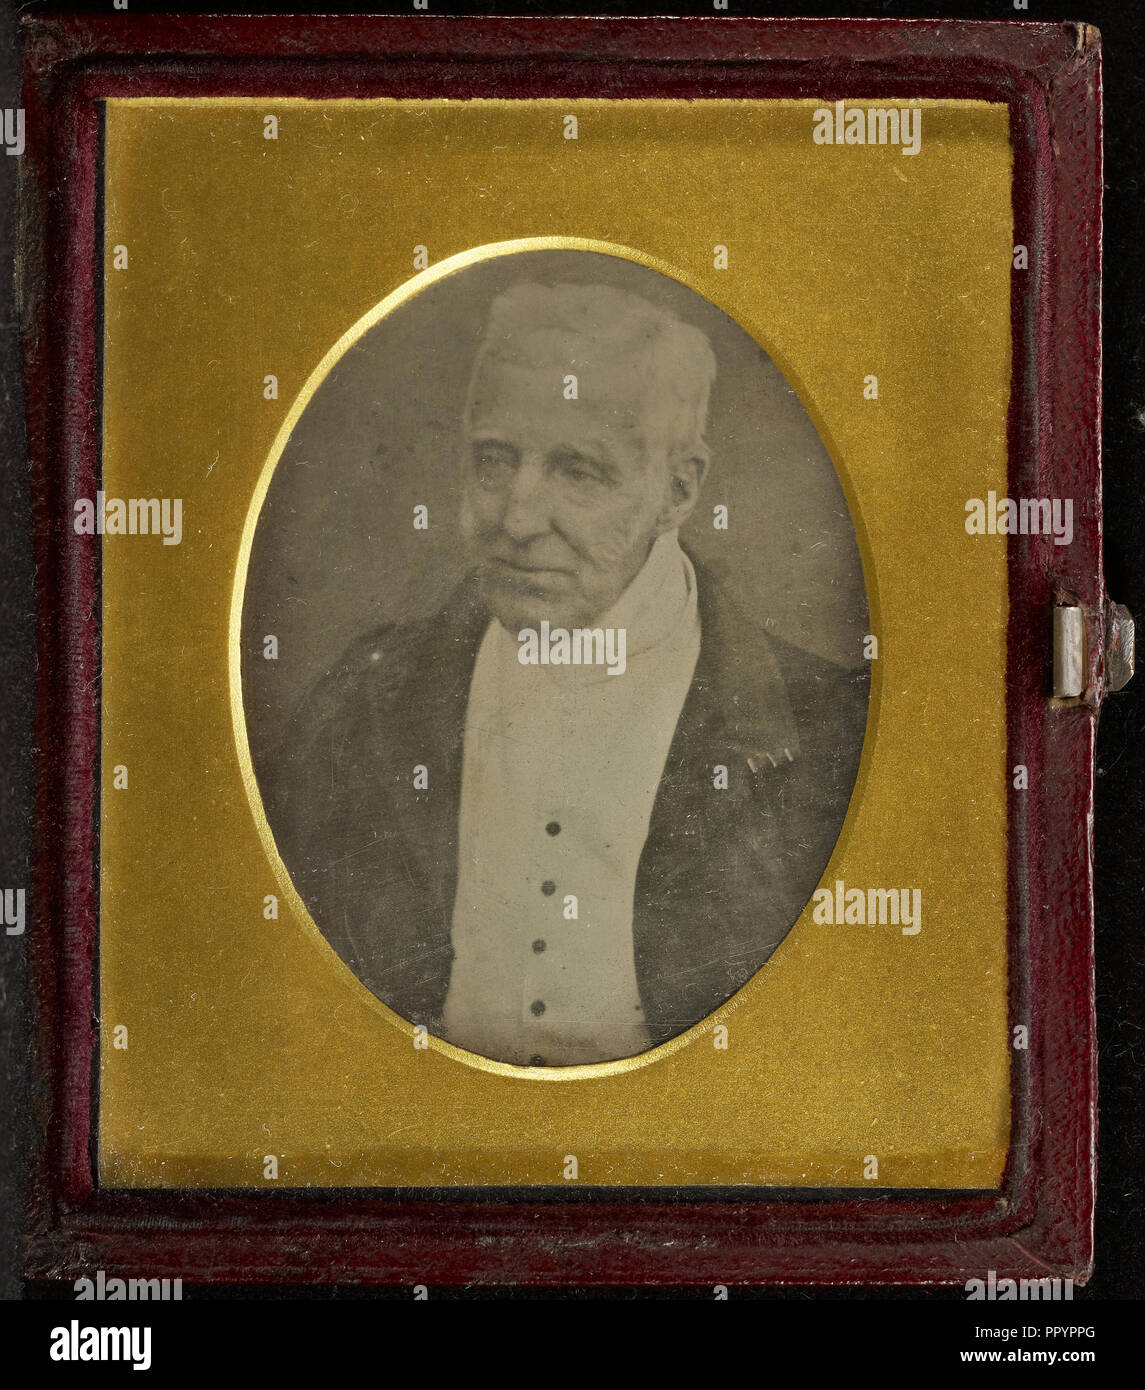 Portrait of the Duke of Wellington; Antoine Claudet, French, 1797 - 1867, May 1, 1844; Daguerreotype - Stock Image